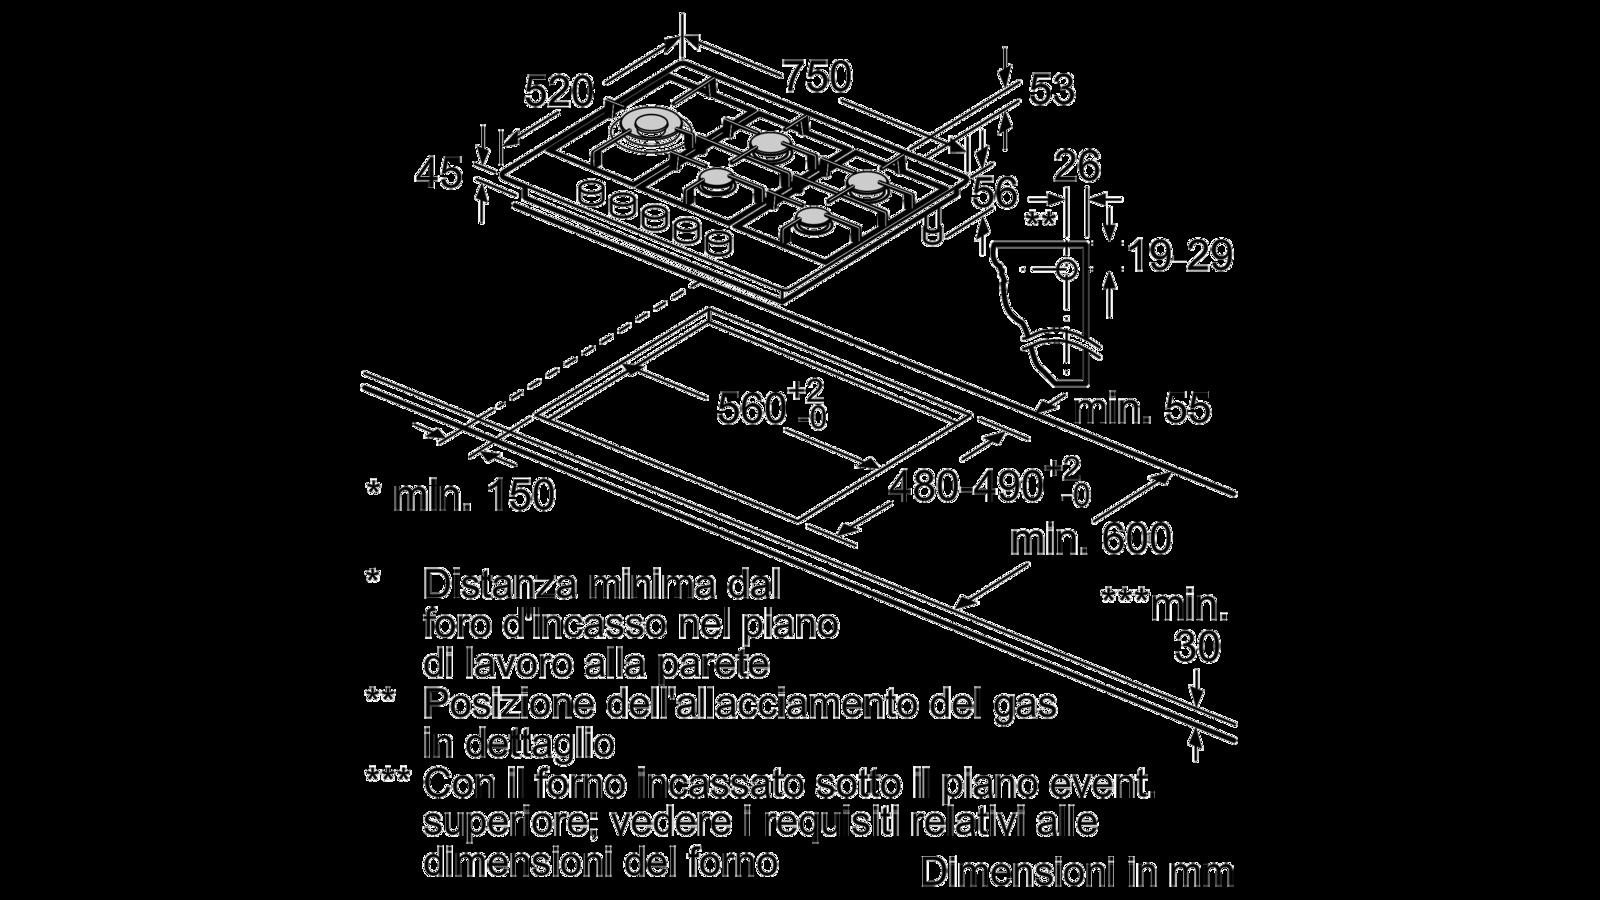 Misure Standard Piano Cottura Cucina serie | 6 piano cottura a gas 75 cm acciaio inox pcs7a5m90